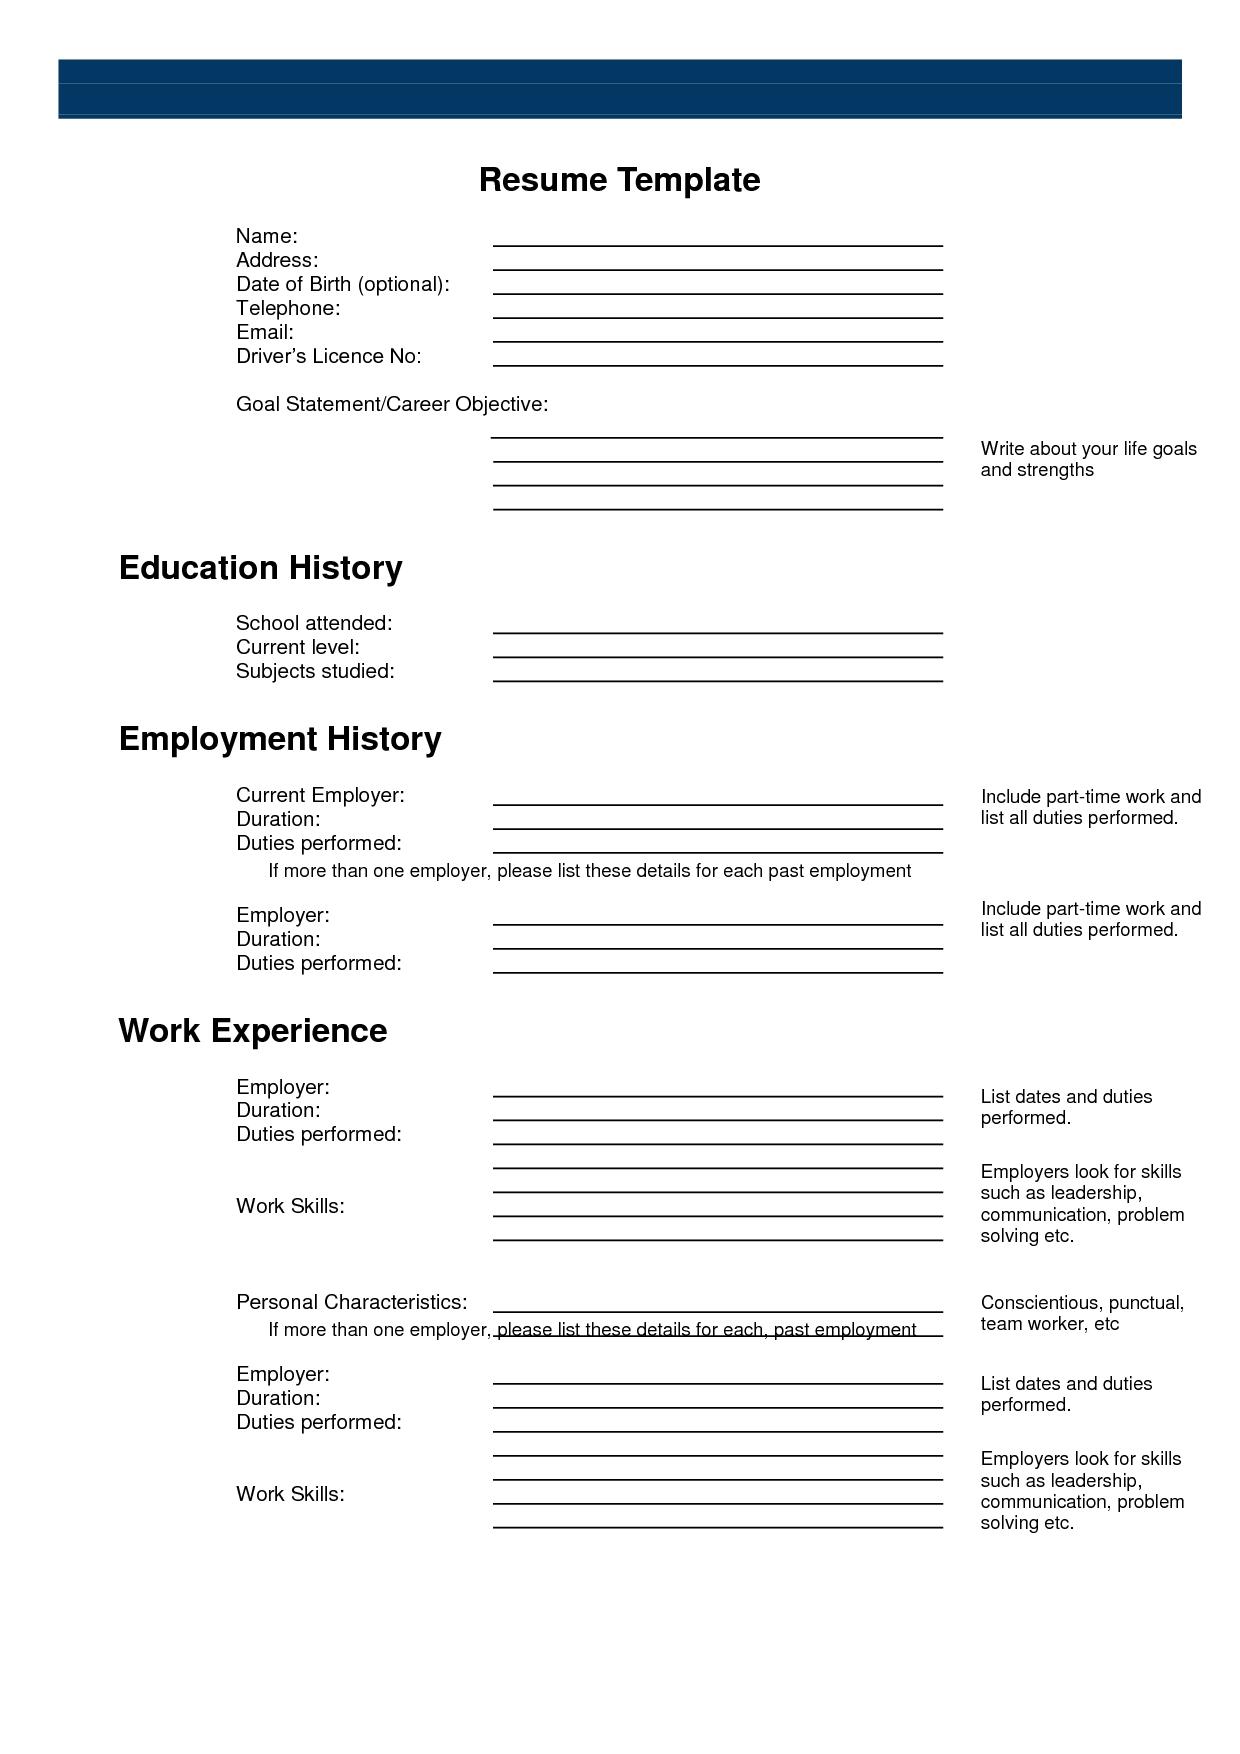 Resume Templates Online Free Printable - Free Resume Creator Online - Free Printable Resume